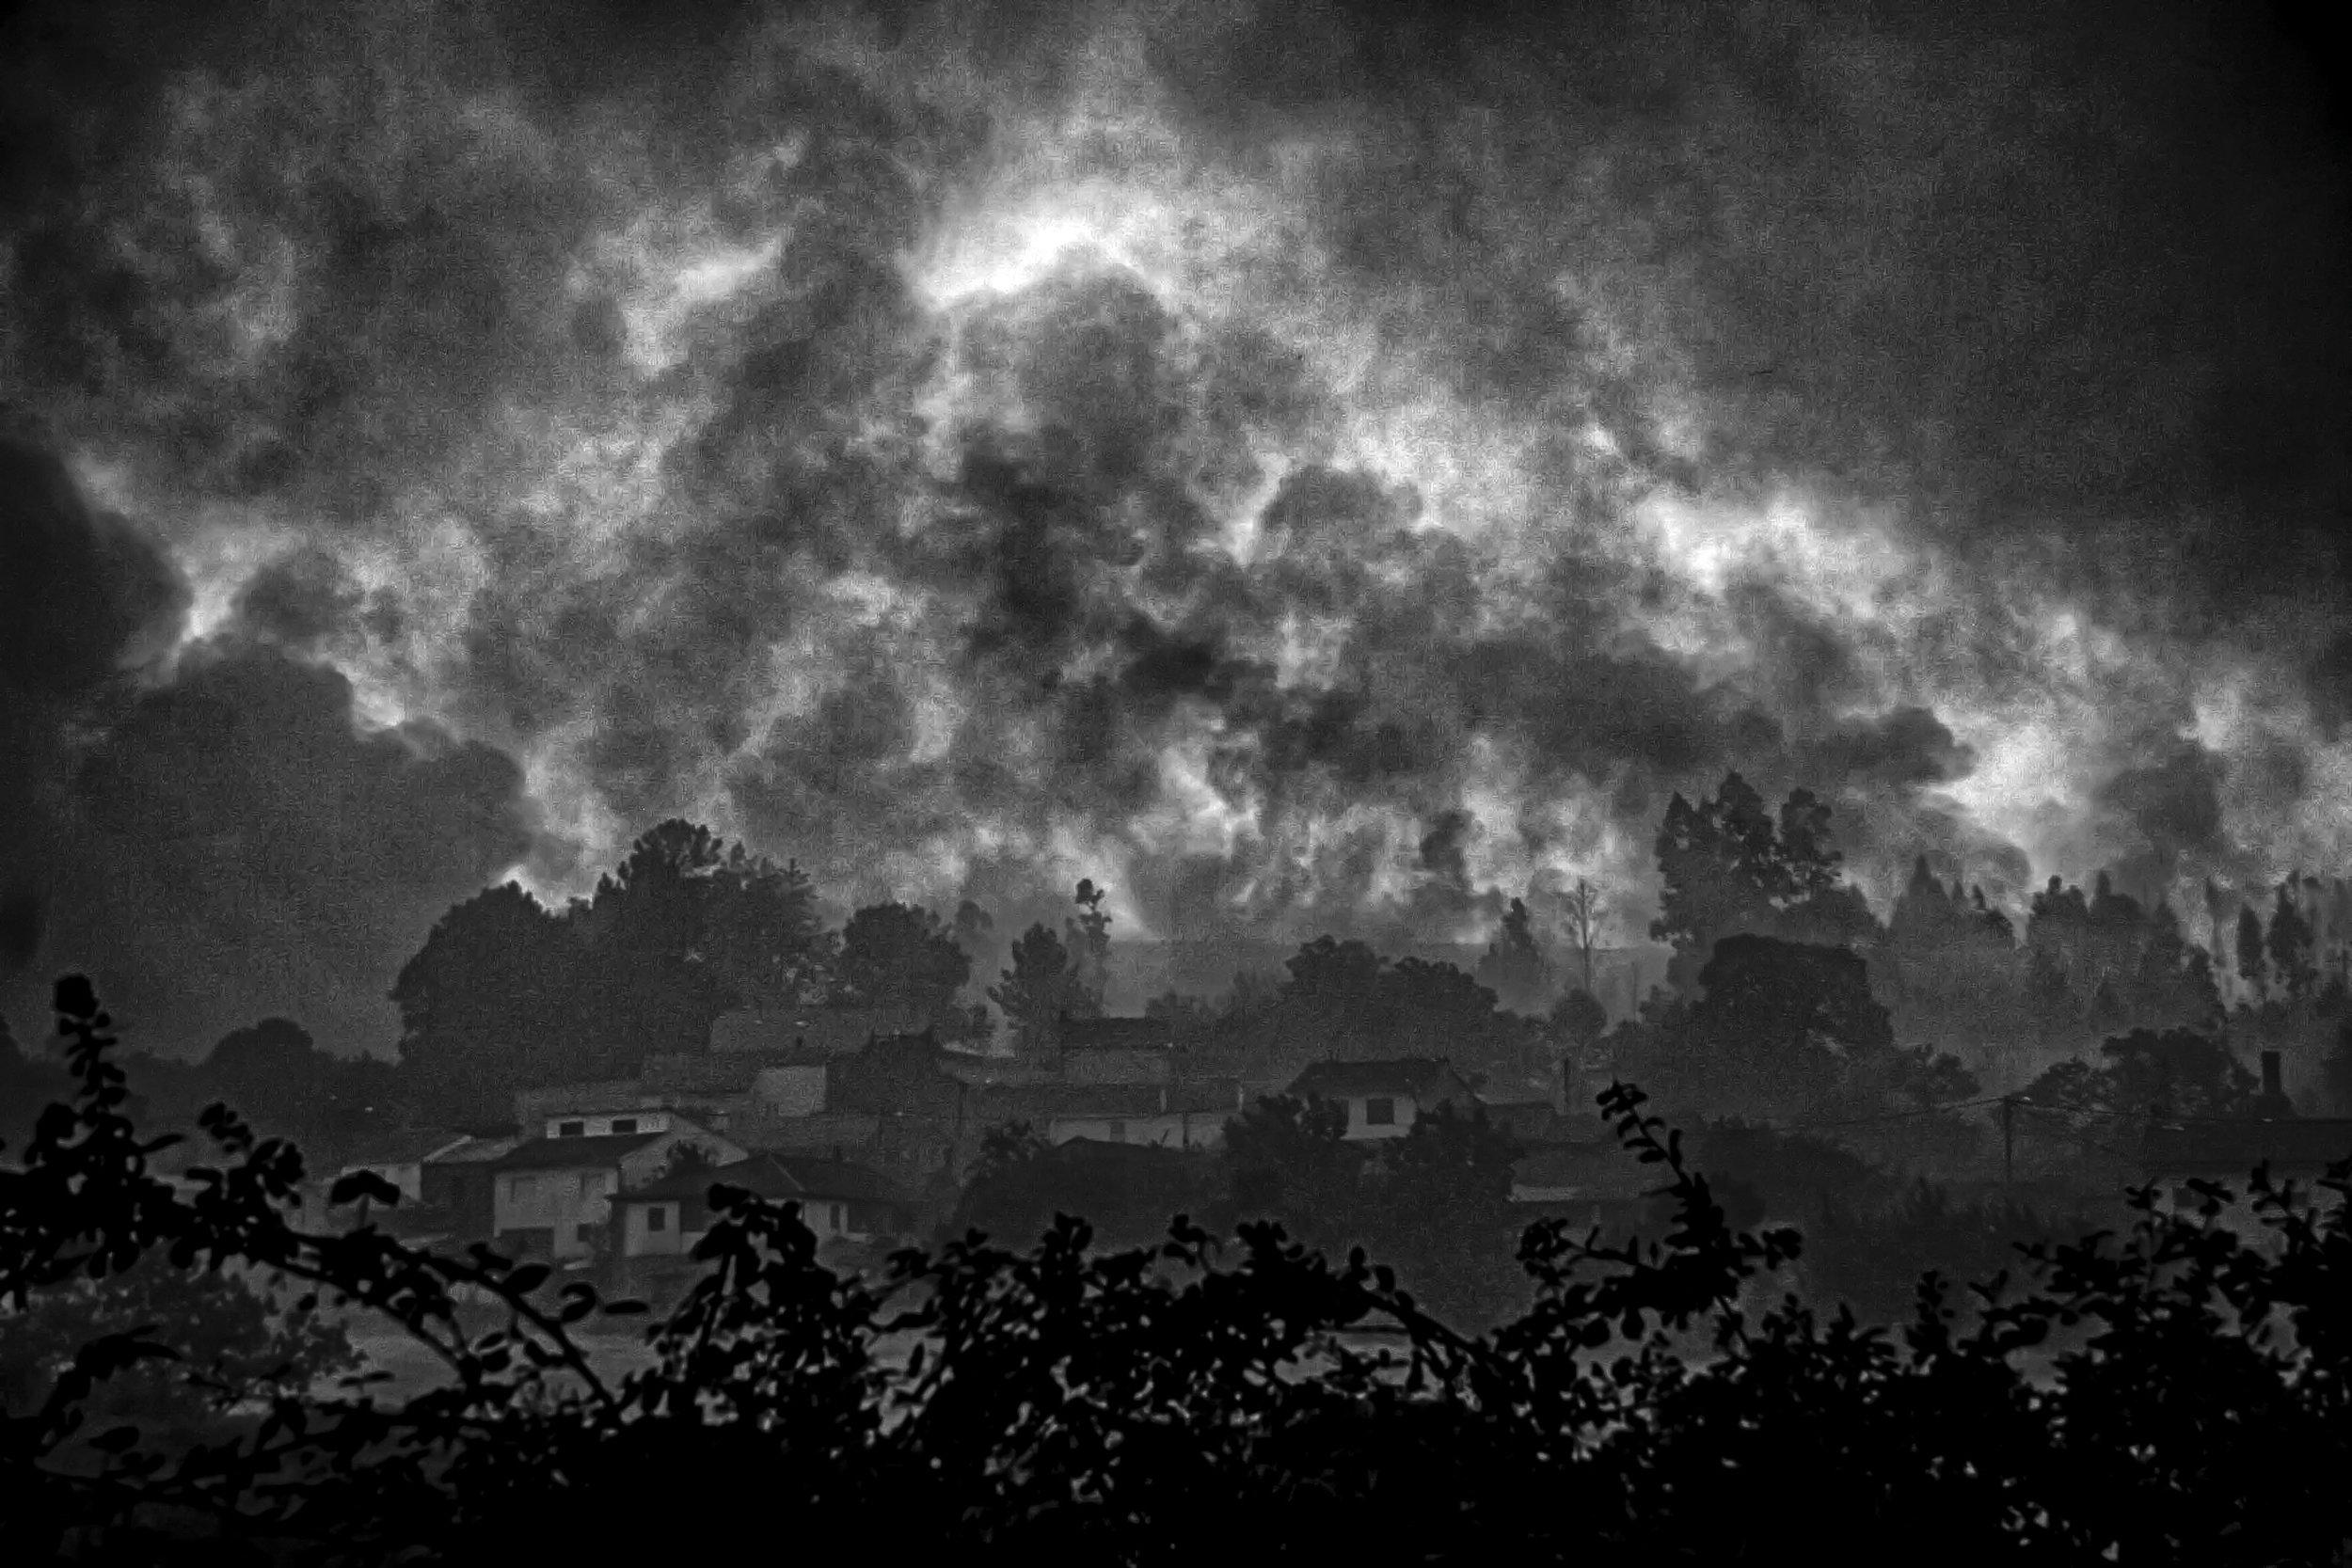 _MG_6006-incendio1.jpg